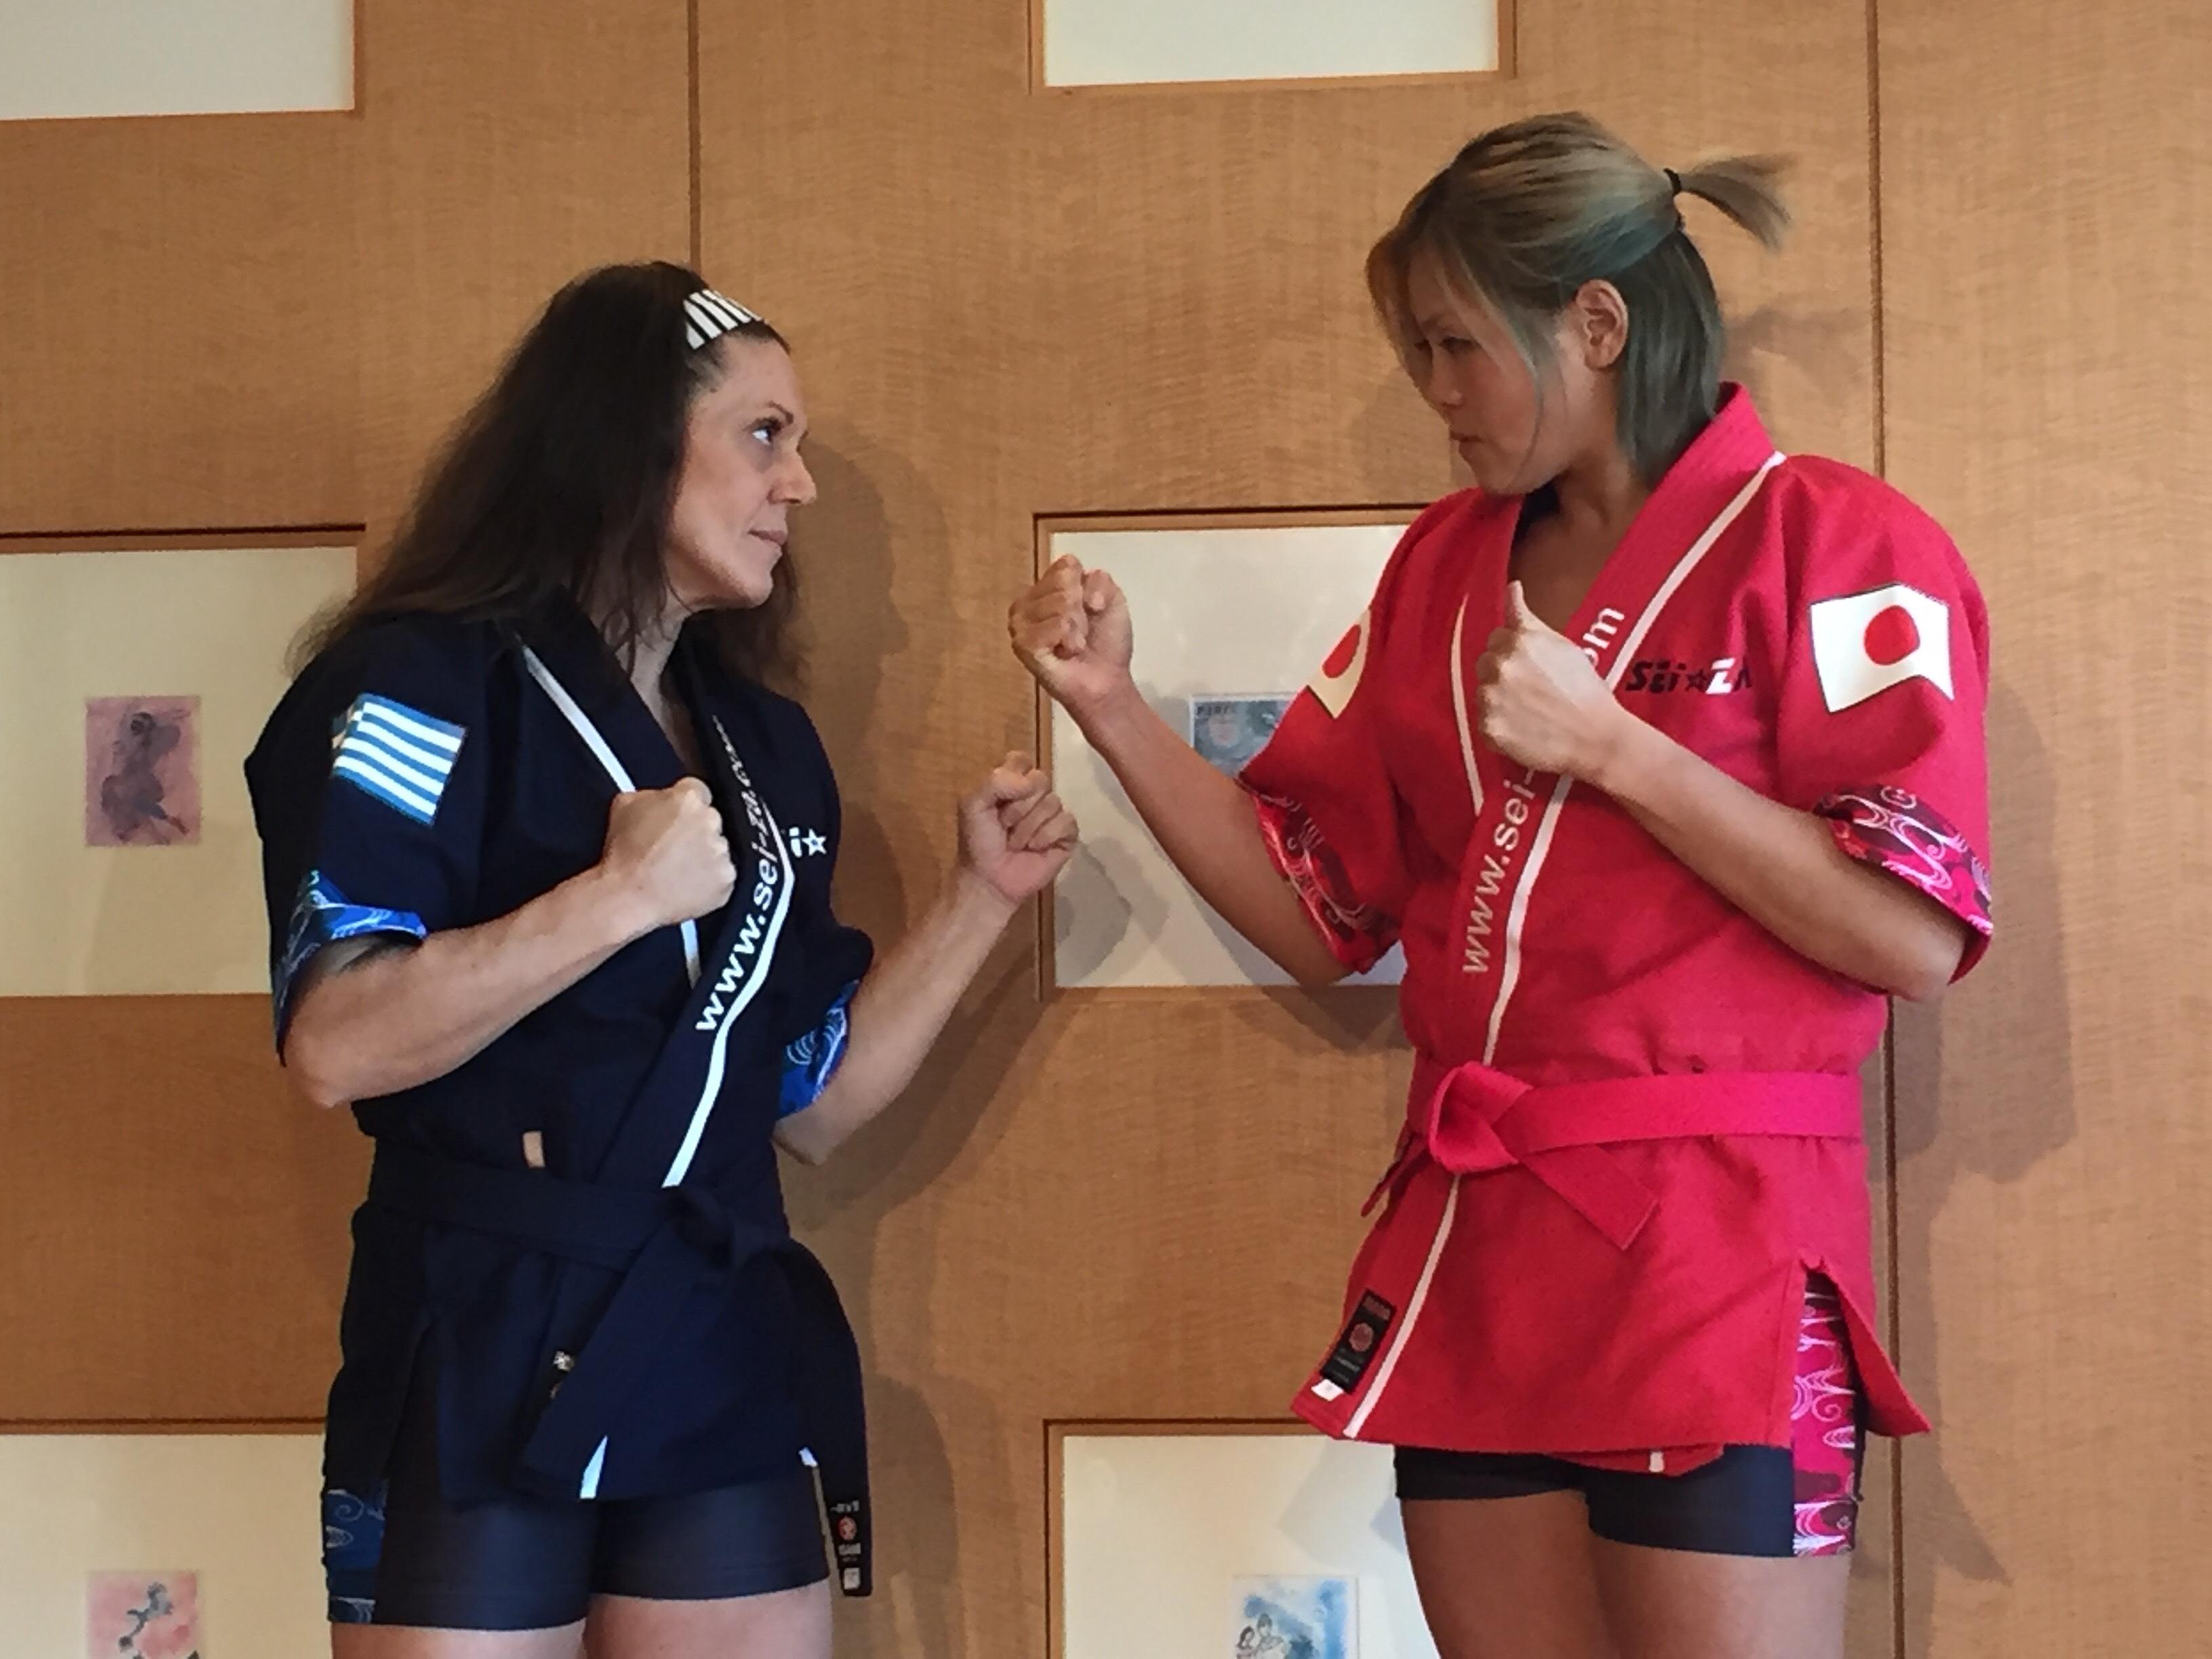 【SEAdLINNNG】19日旗揚げ戦を行うSEI☆ZAに参戦の高橋奈七永が前日記者会見に登場し「プロレスラーの強さを証明する」とコメントを出した!